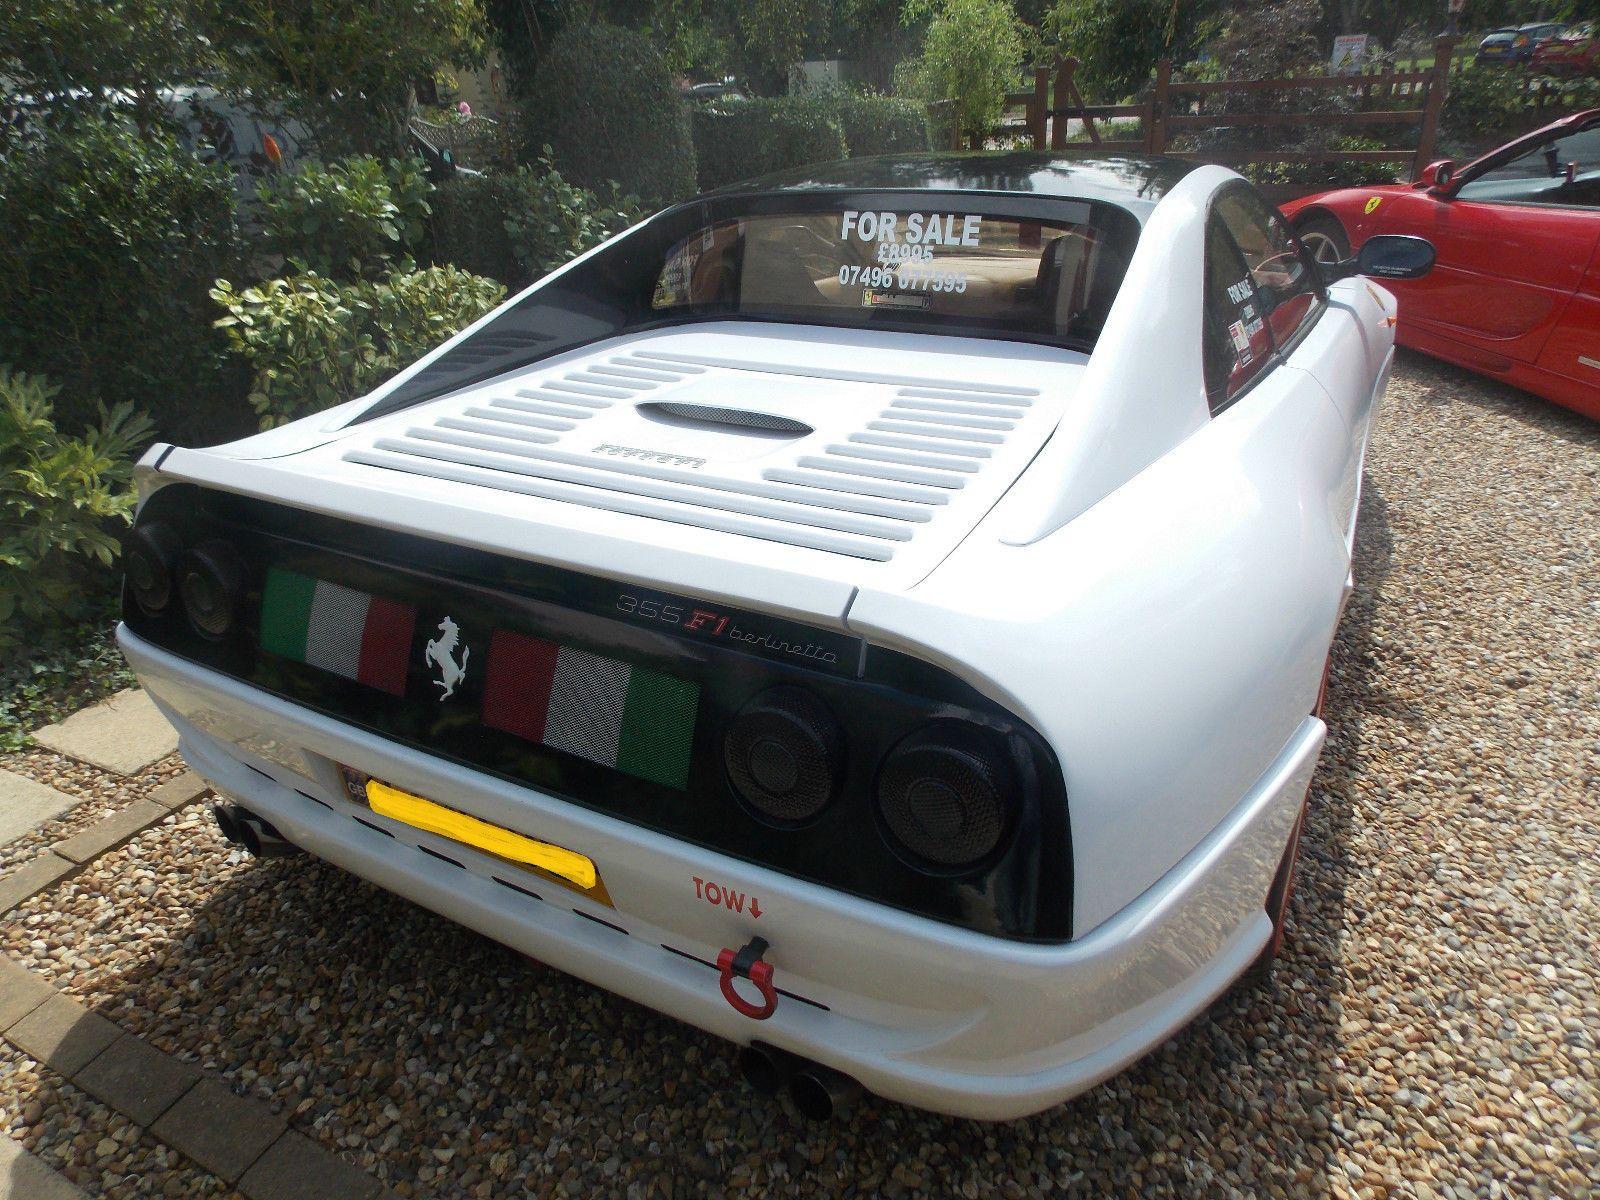 264c5b4740ae305b7e218d1d8648cc05 Marvelous Ferrari Mondial 8 Te Koop Cars Trend